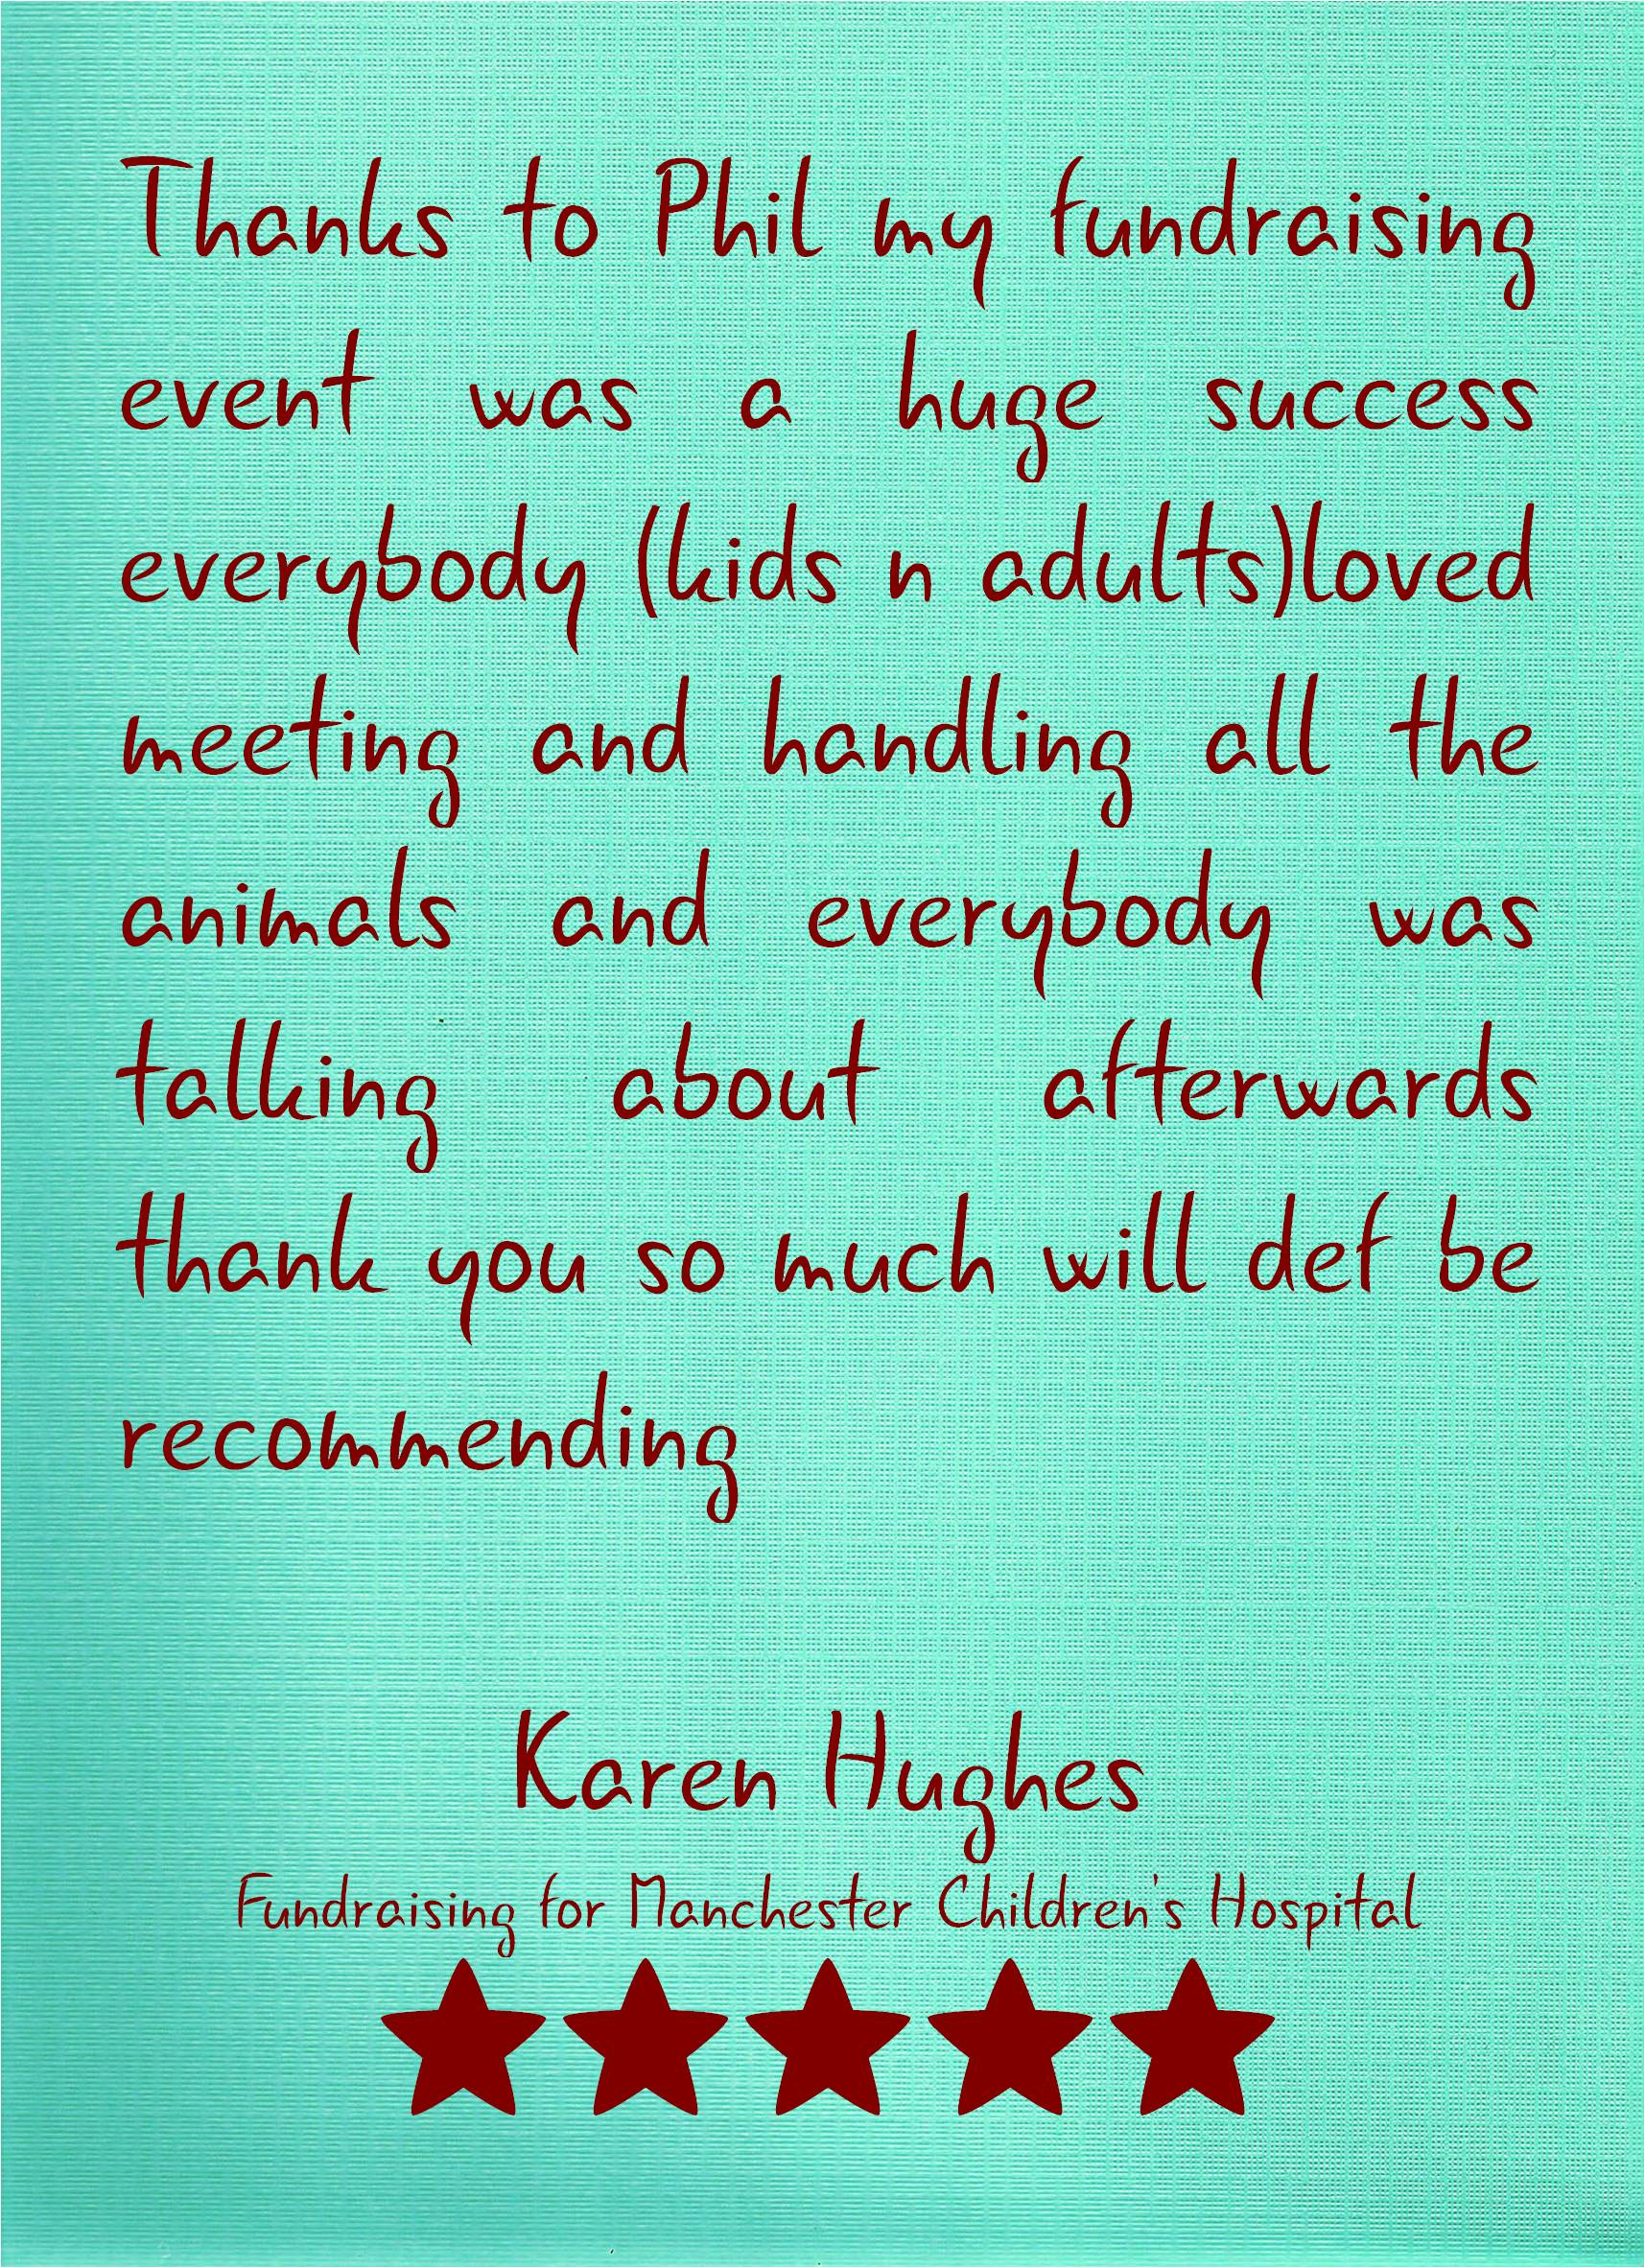 CP-Karen Hughes - fb